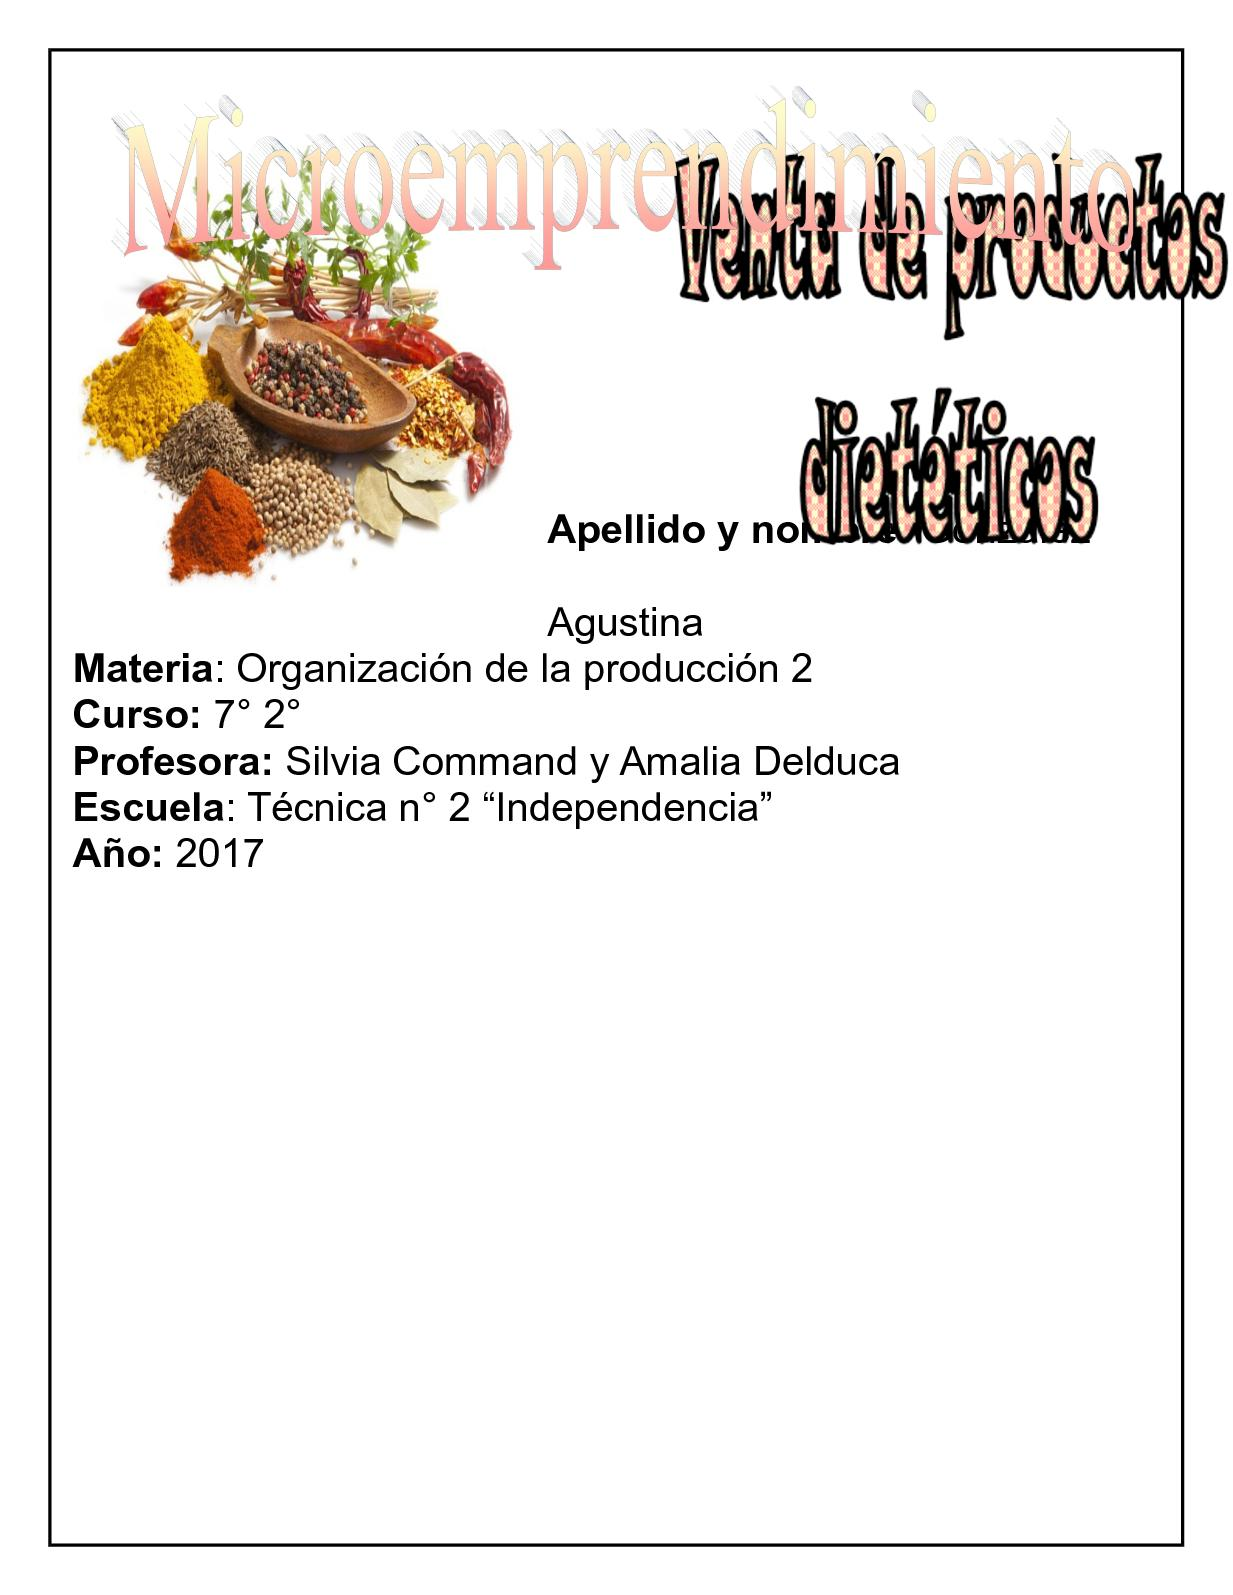 Calaméo - Trabajo Practico Microemprendimiento Agustina Gonzalez